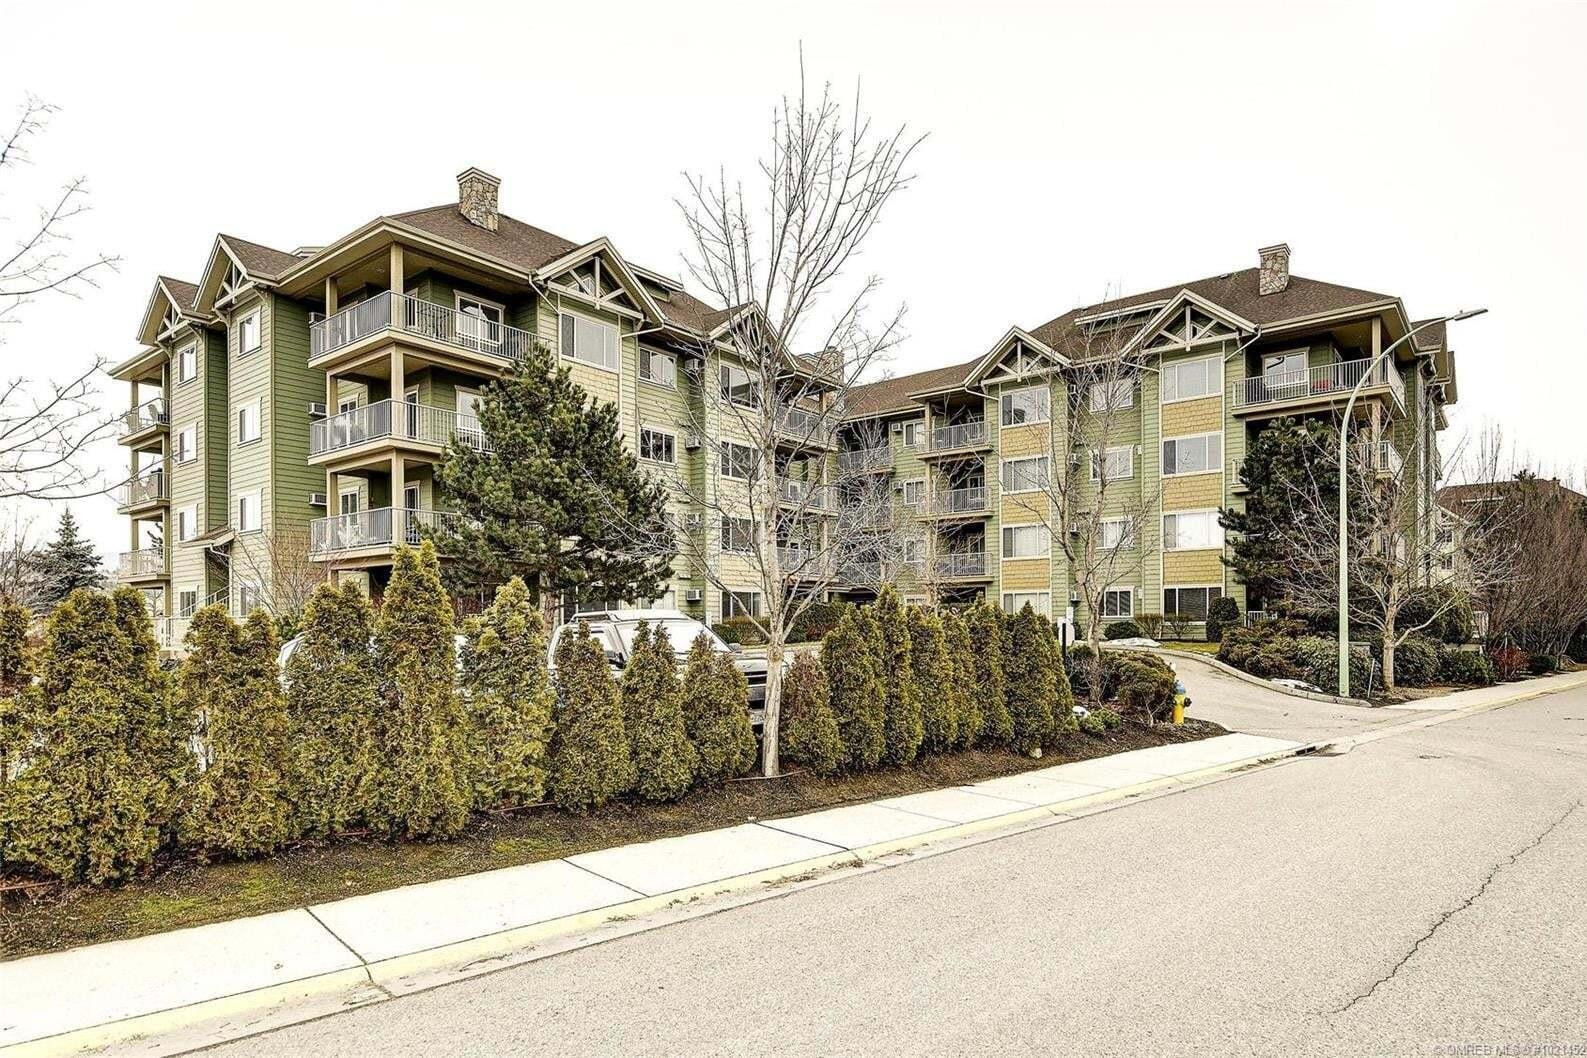 Condo for sale at 688 Lequime Rd Kelowna British Columbia - MLS: 10214523